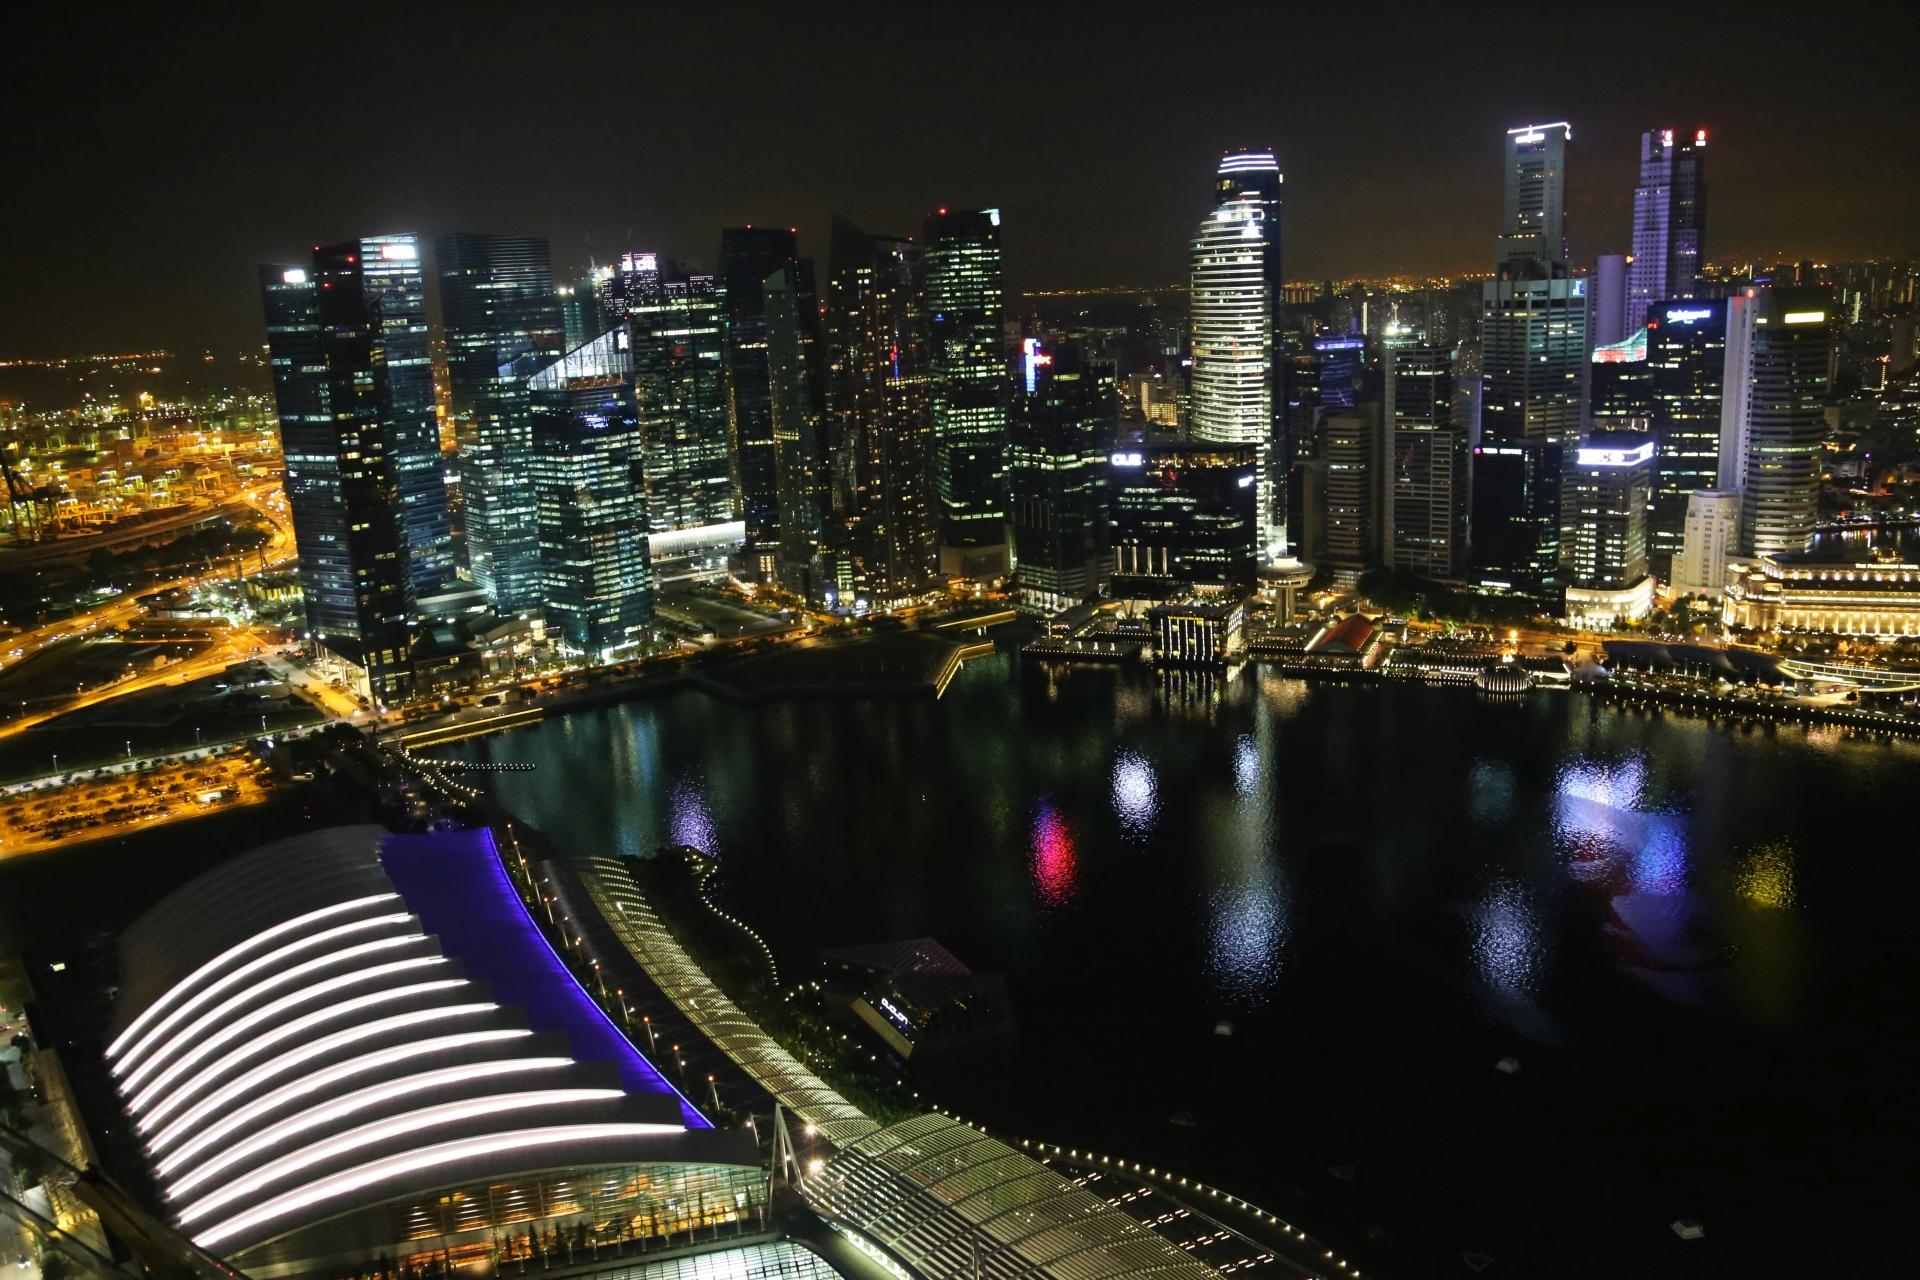 Singapore 2013 # 01